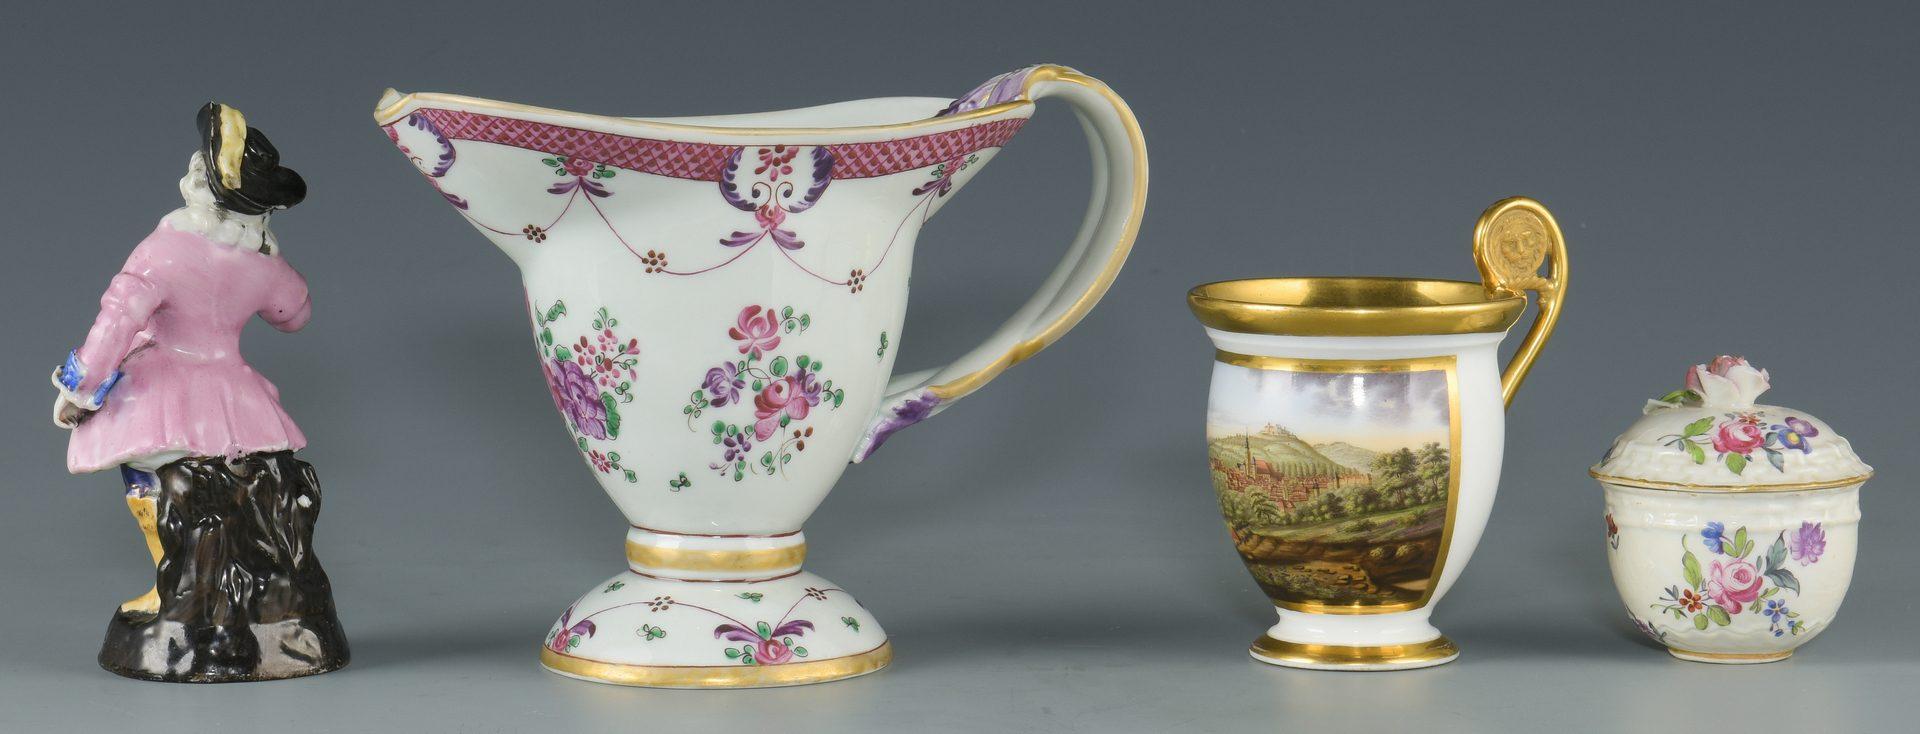 Lot 610: 4 European Porcelain items, incl. Samson